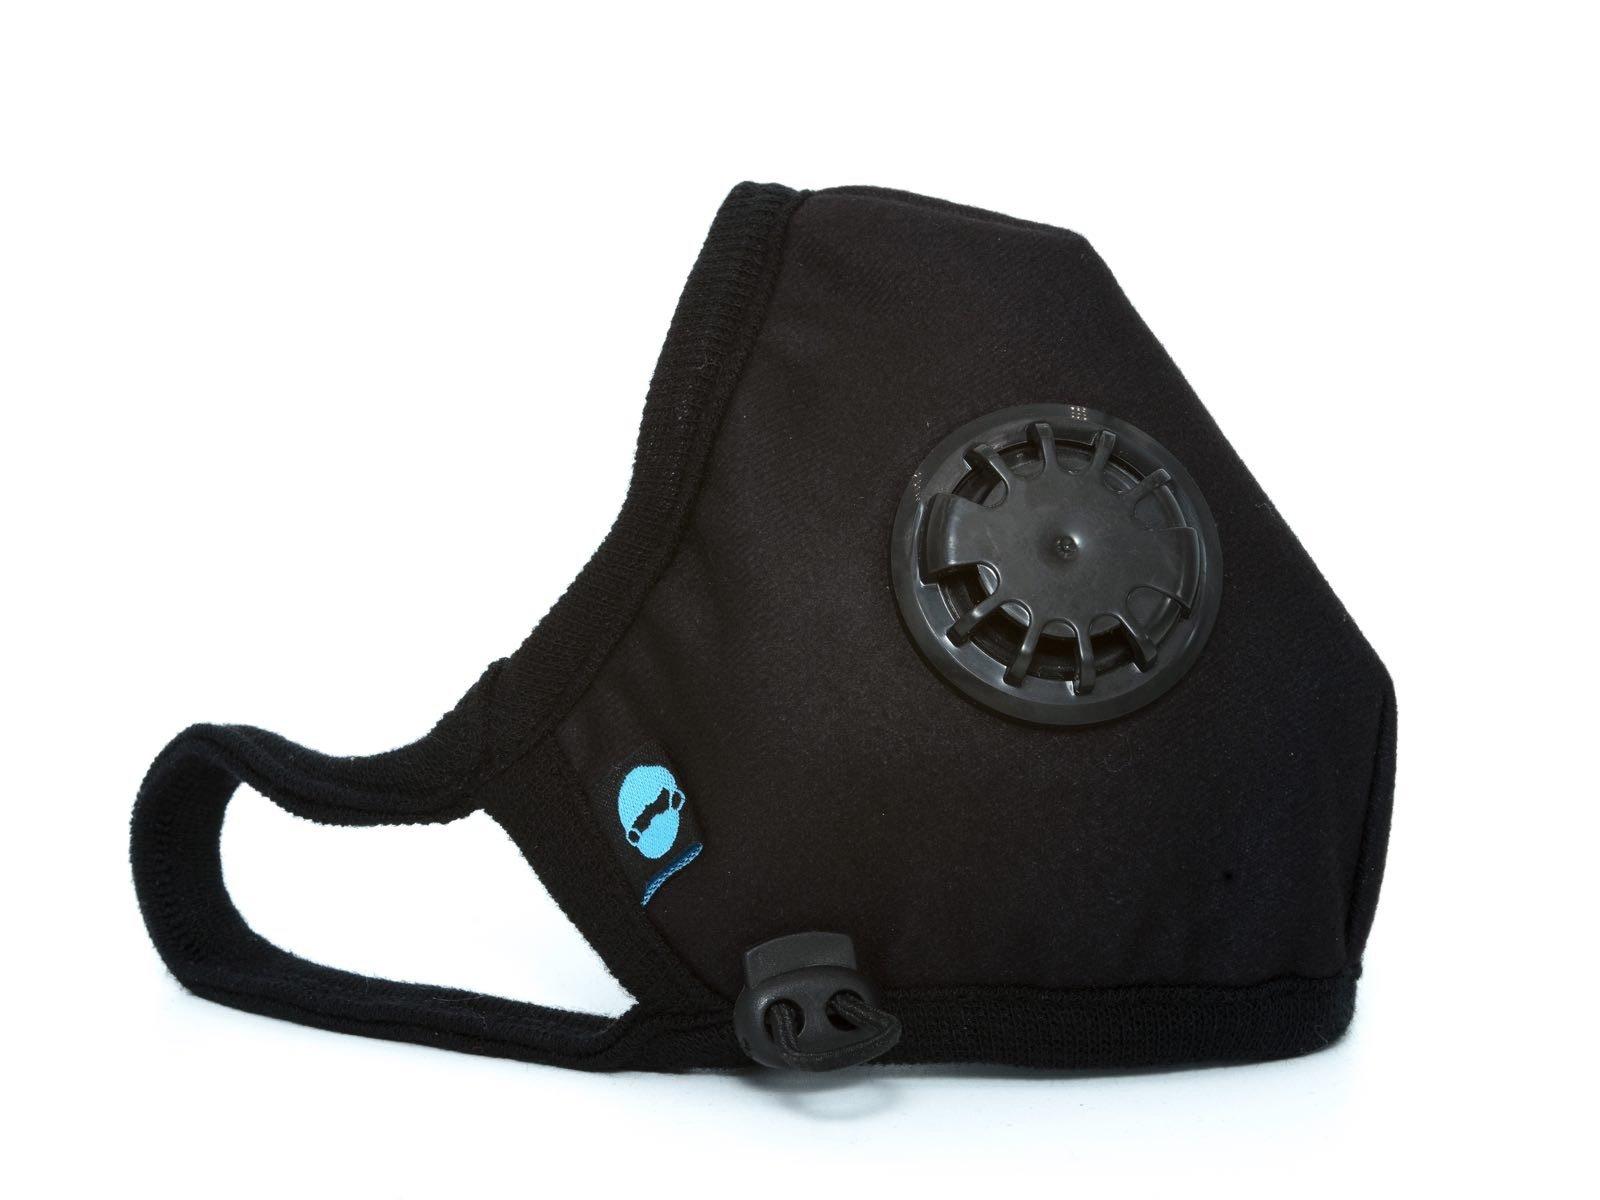 Cambridge Mask Co Pro Anti Pollution N99 Washable Military Grade Respirator with Adjustable Straps - Churchill S Pro